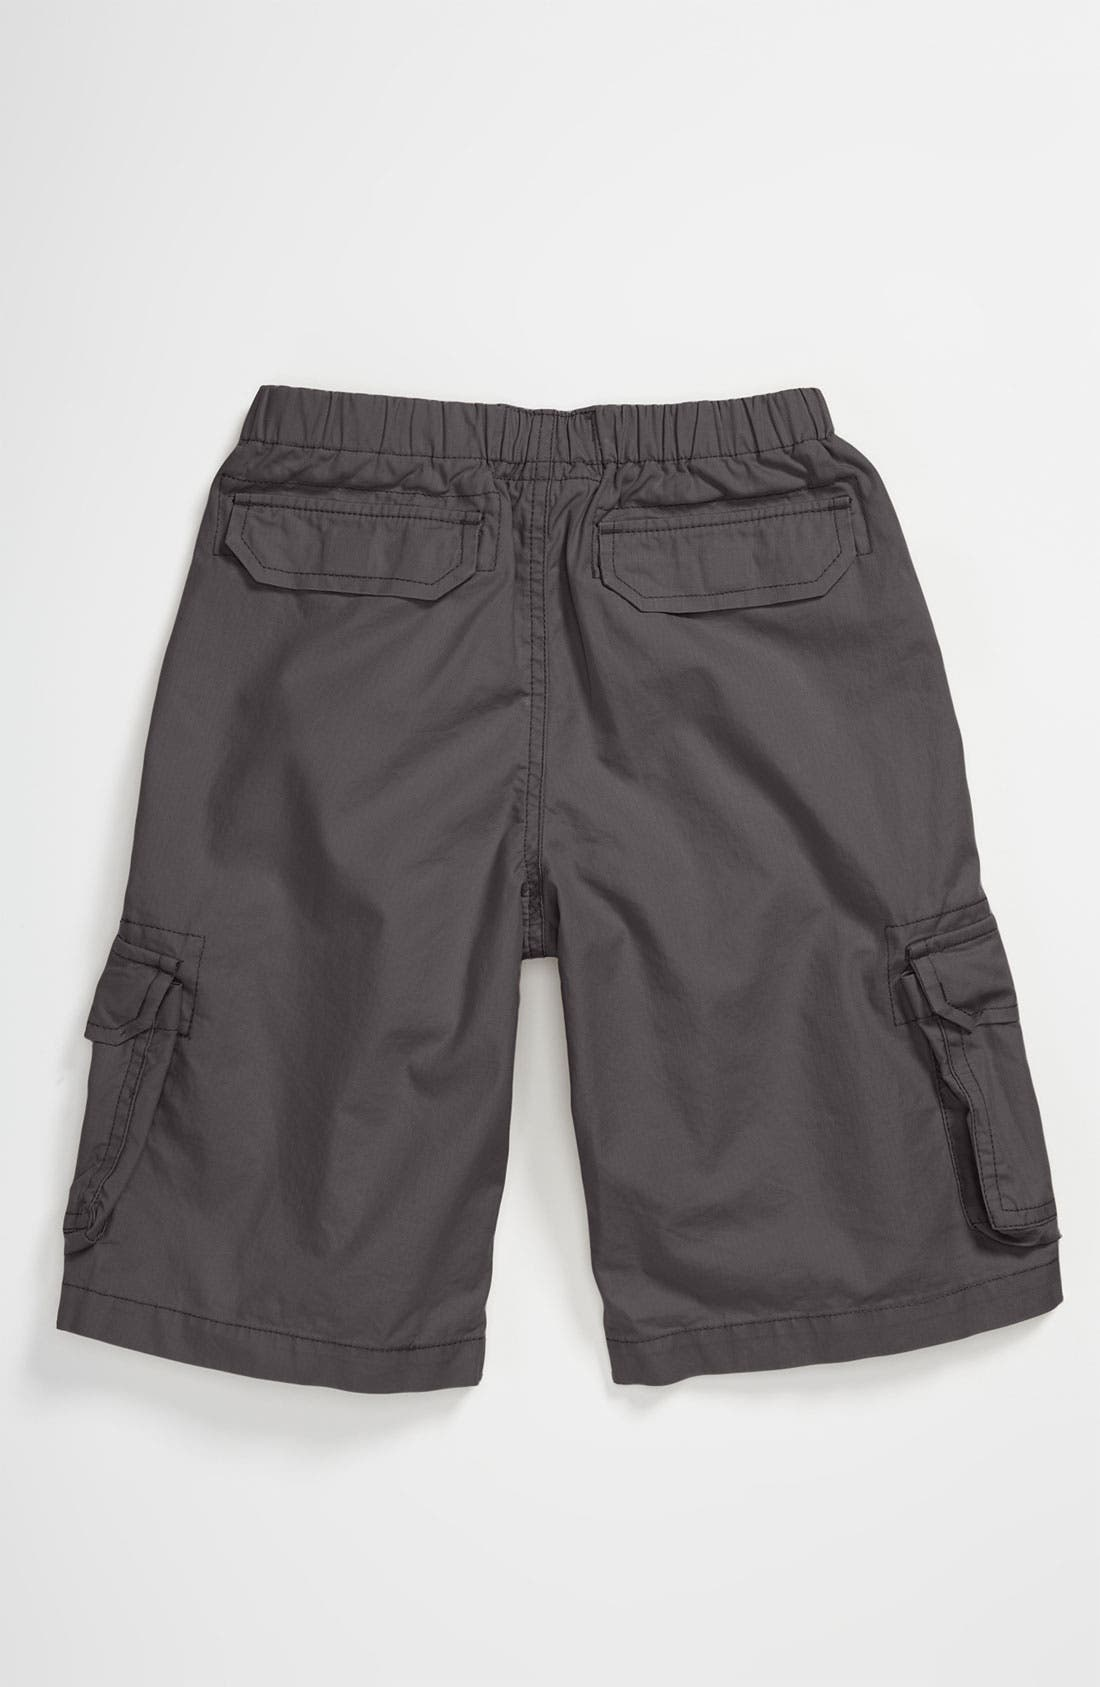 Alternate Image 2  - Peek 'New Beach' Cargo Shorts (Toddler, Little Boys & Big Boys)